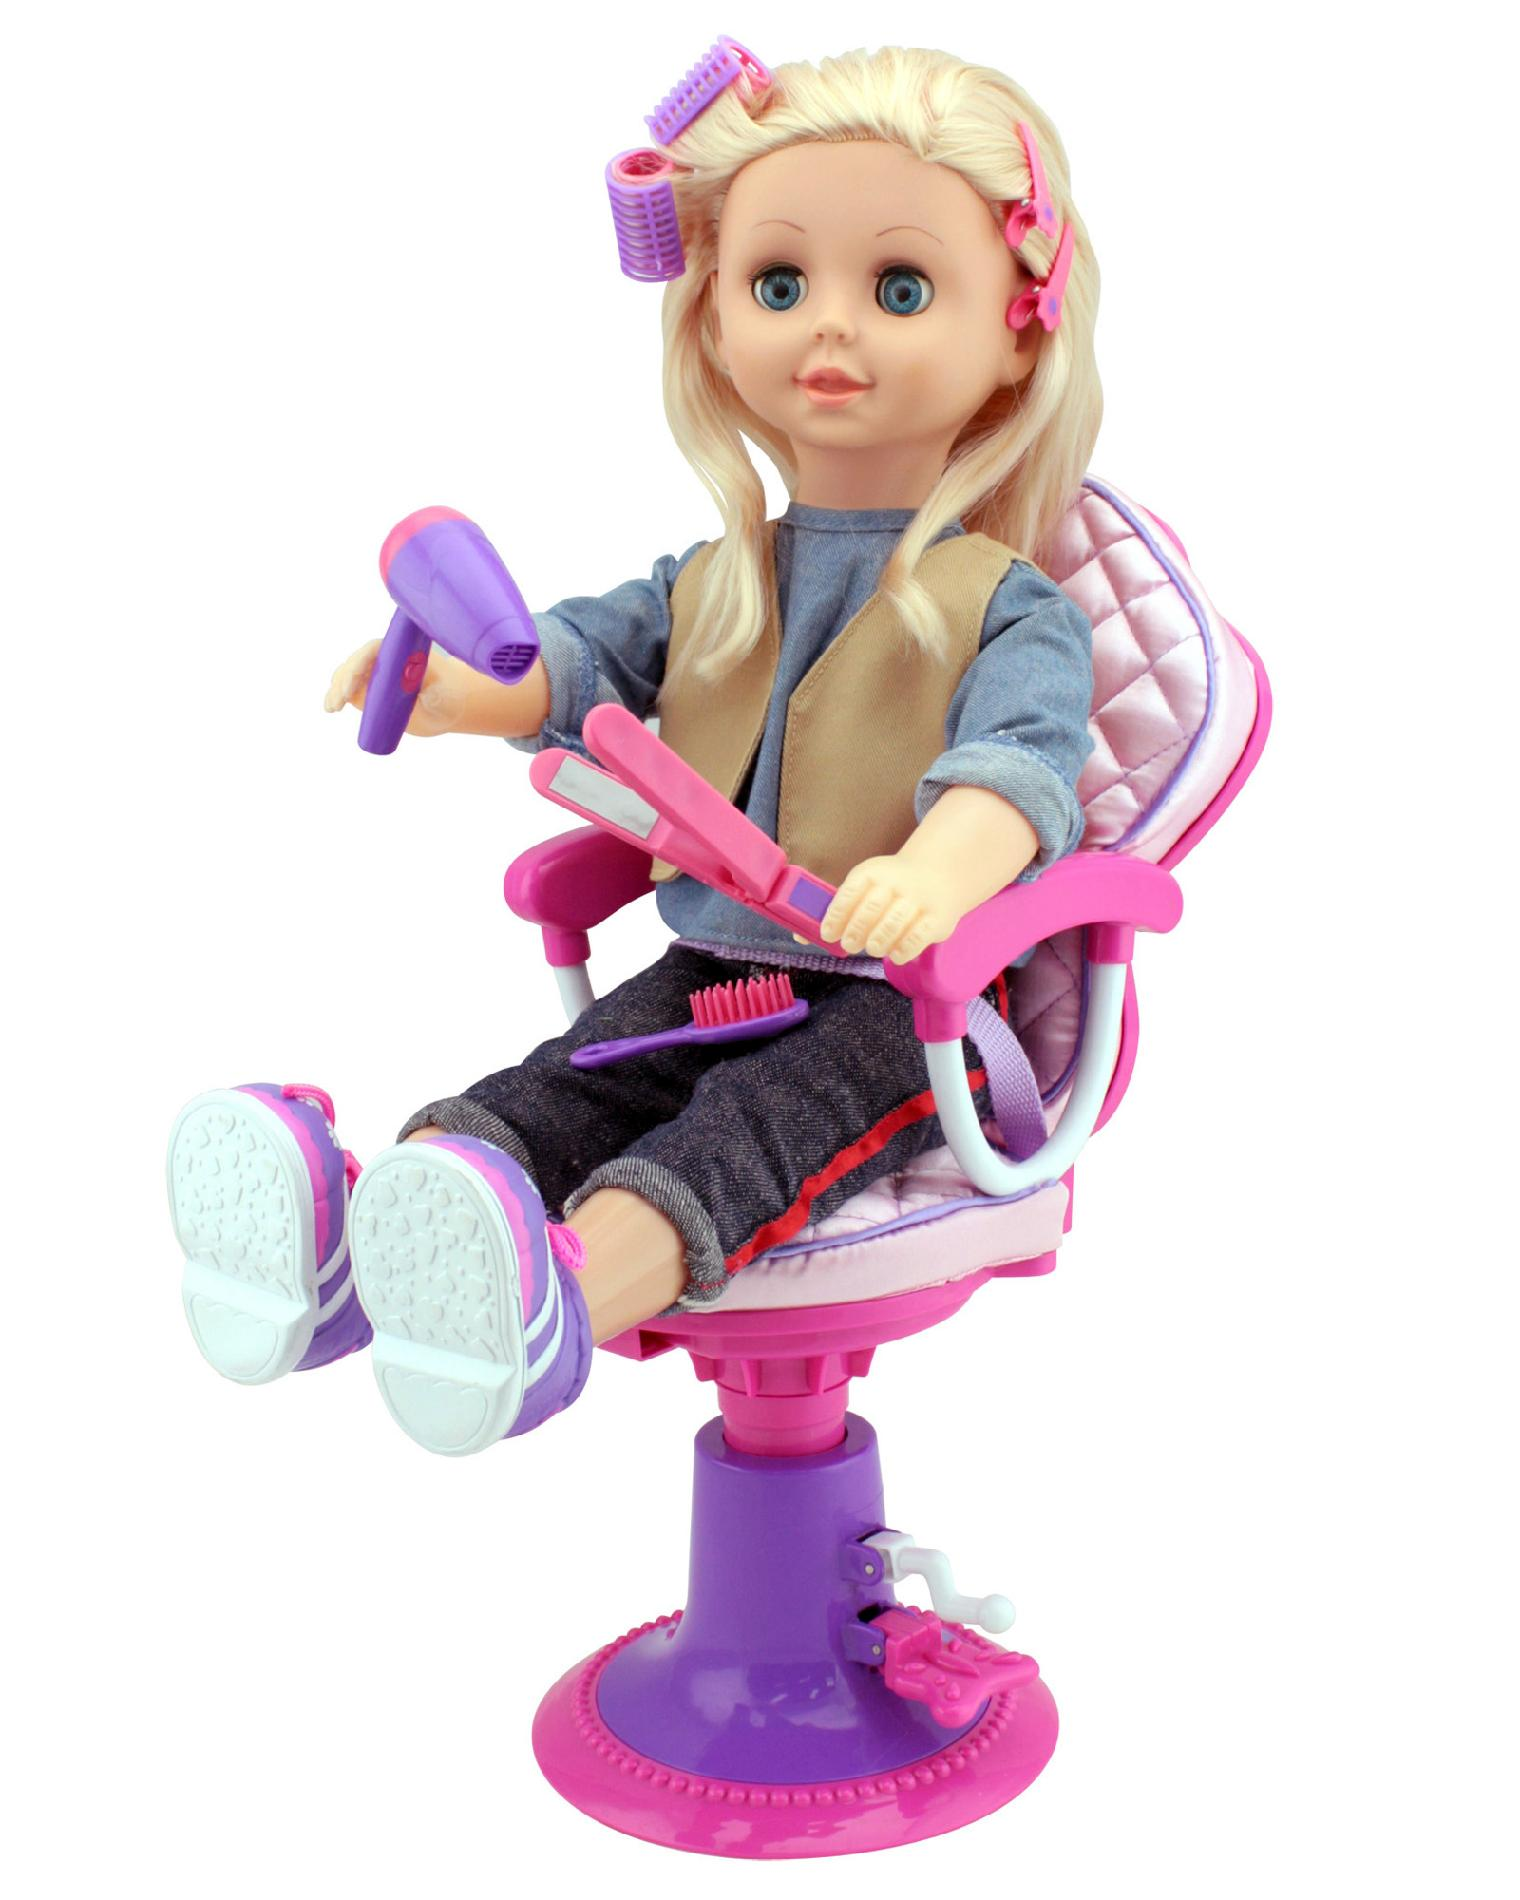 doll salon chair pink royal throne 18 w accessories 2